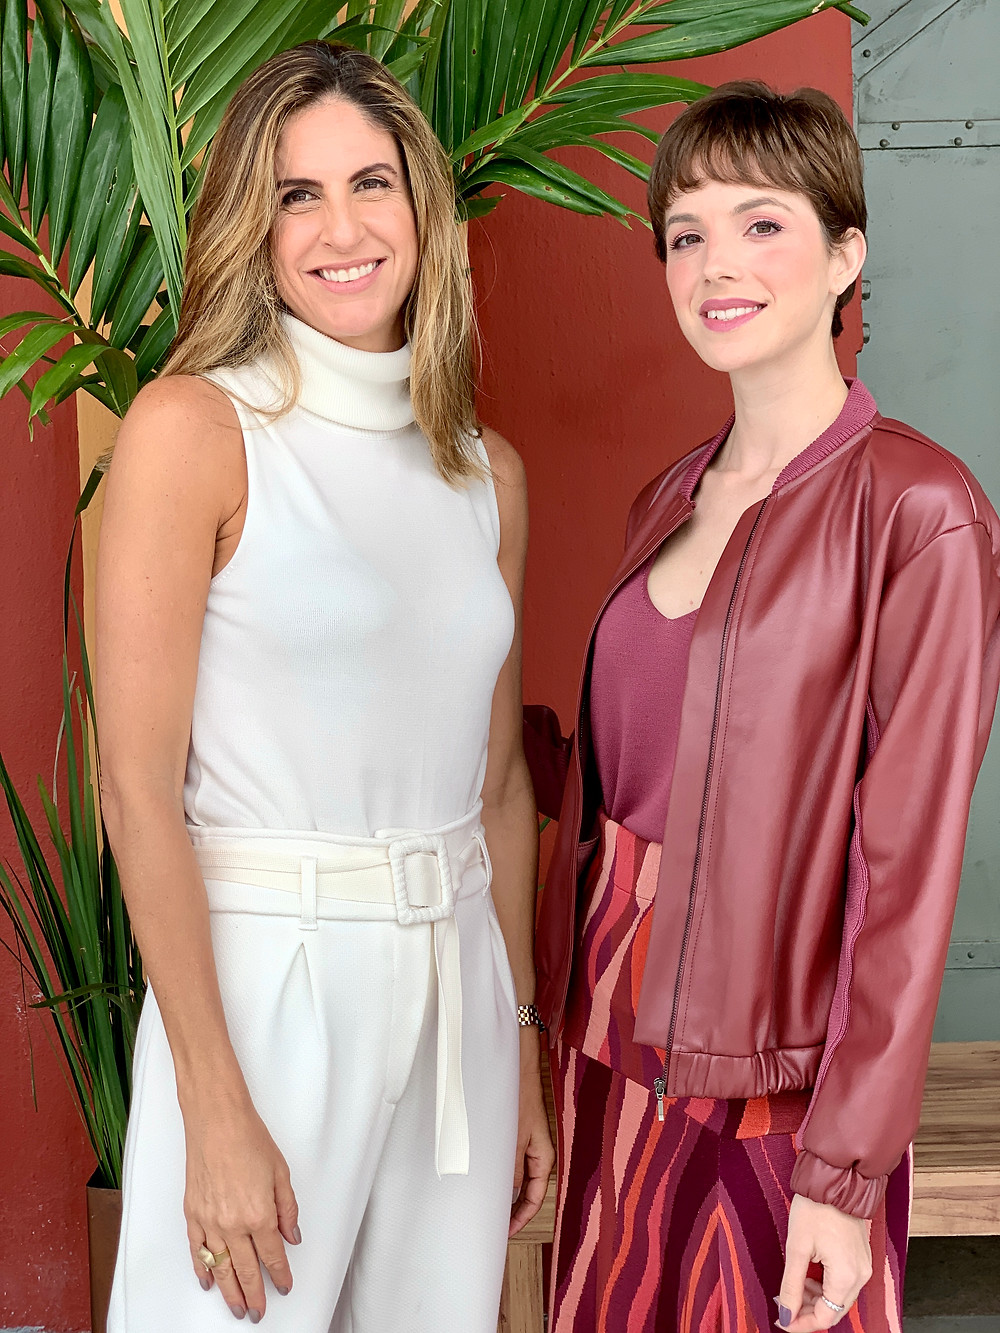 Viviane Furrier e Dani Lachter no Veste Rio 2019